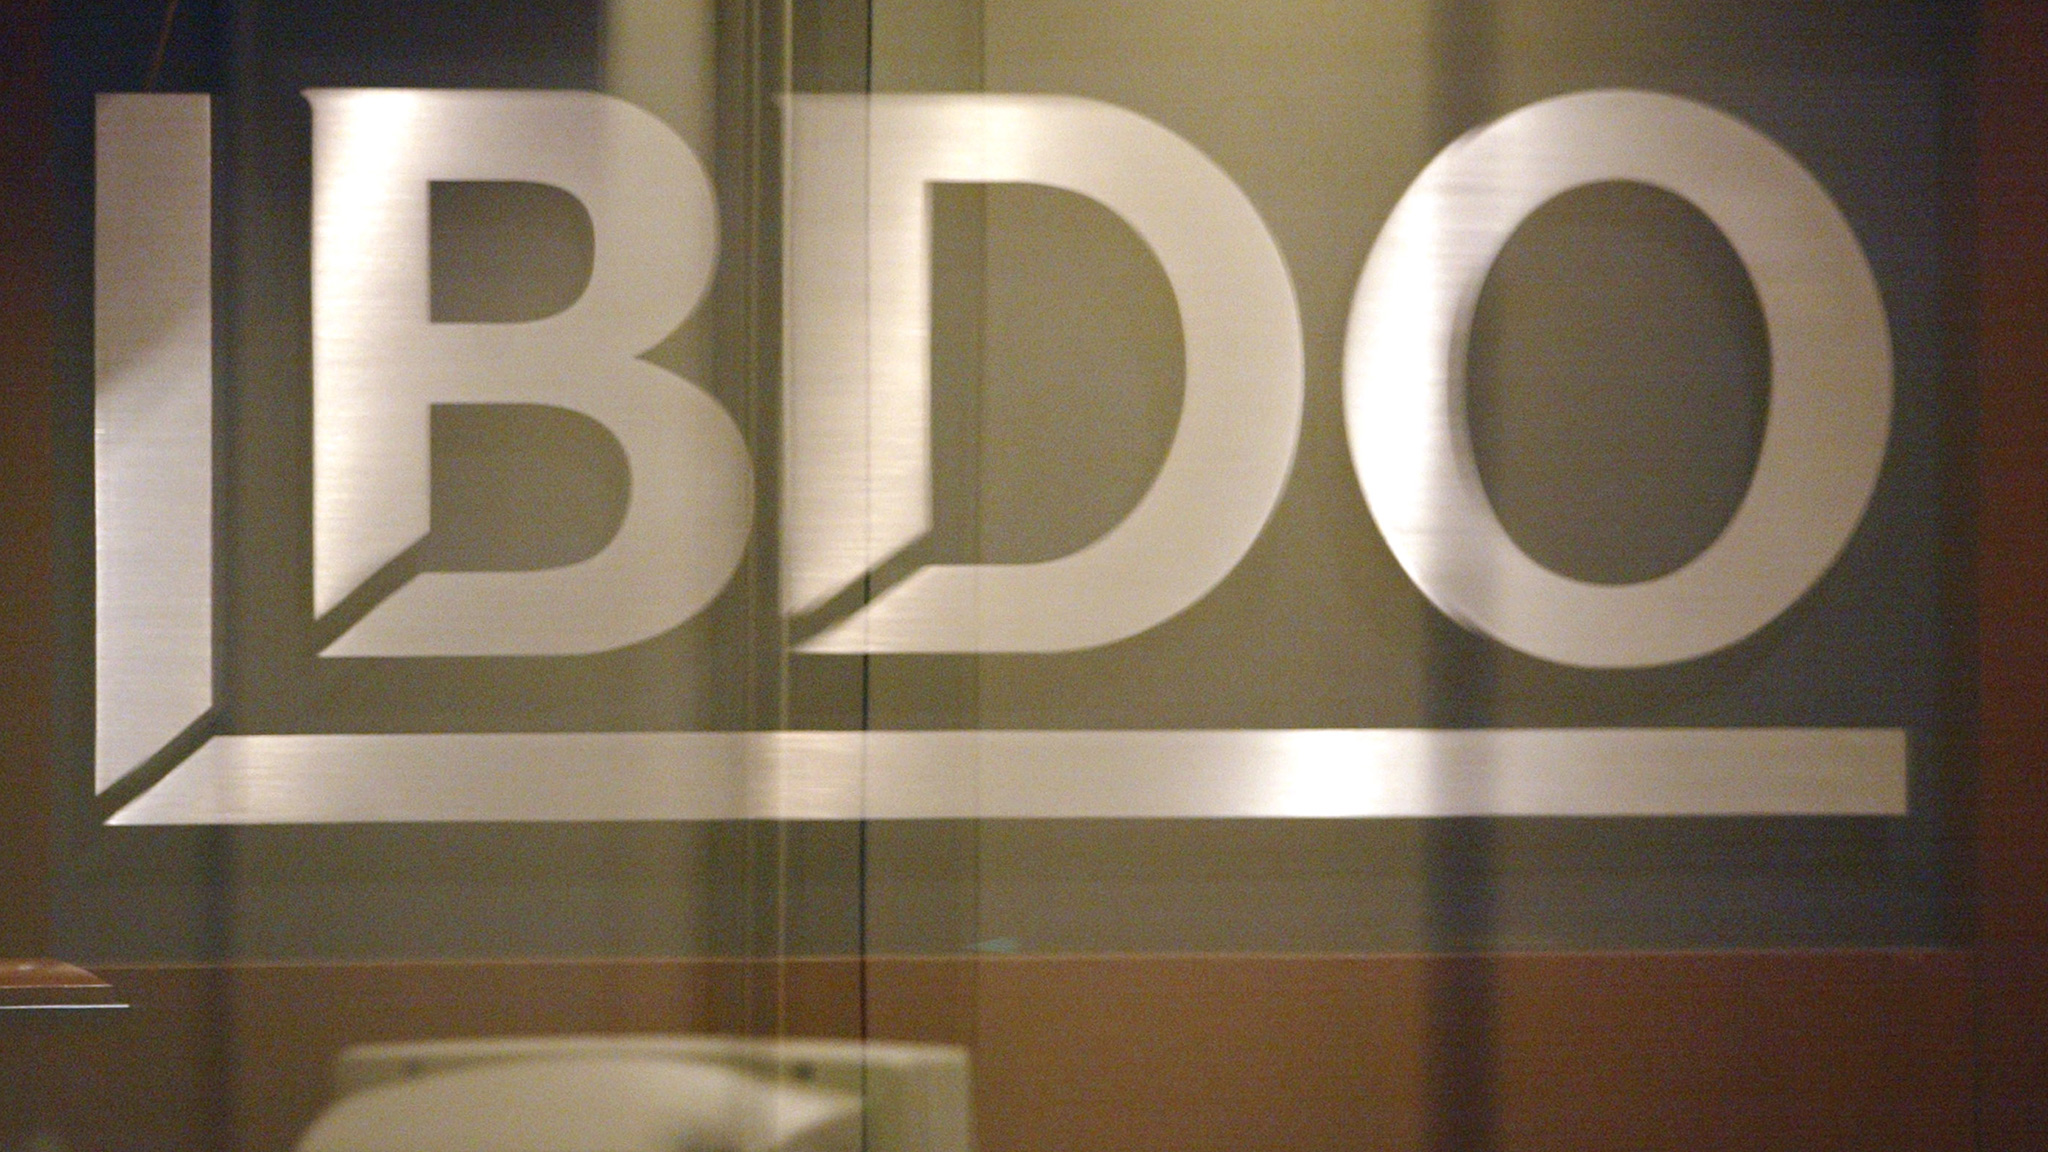 BDO partners paid more than KPMG rivals | Financial Times